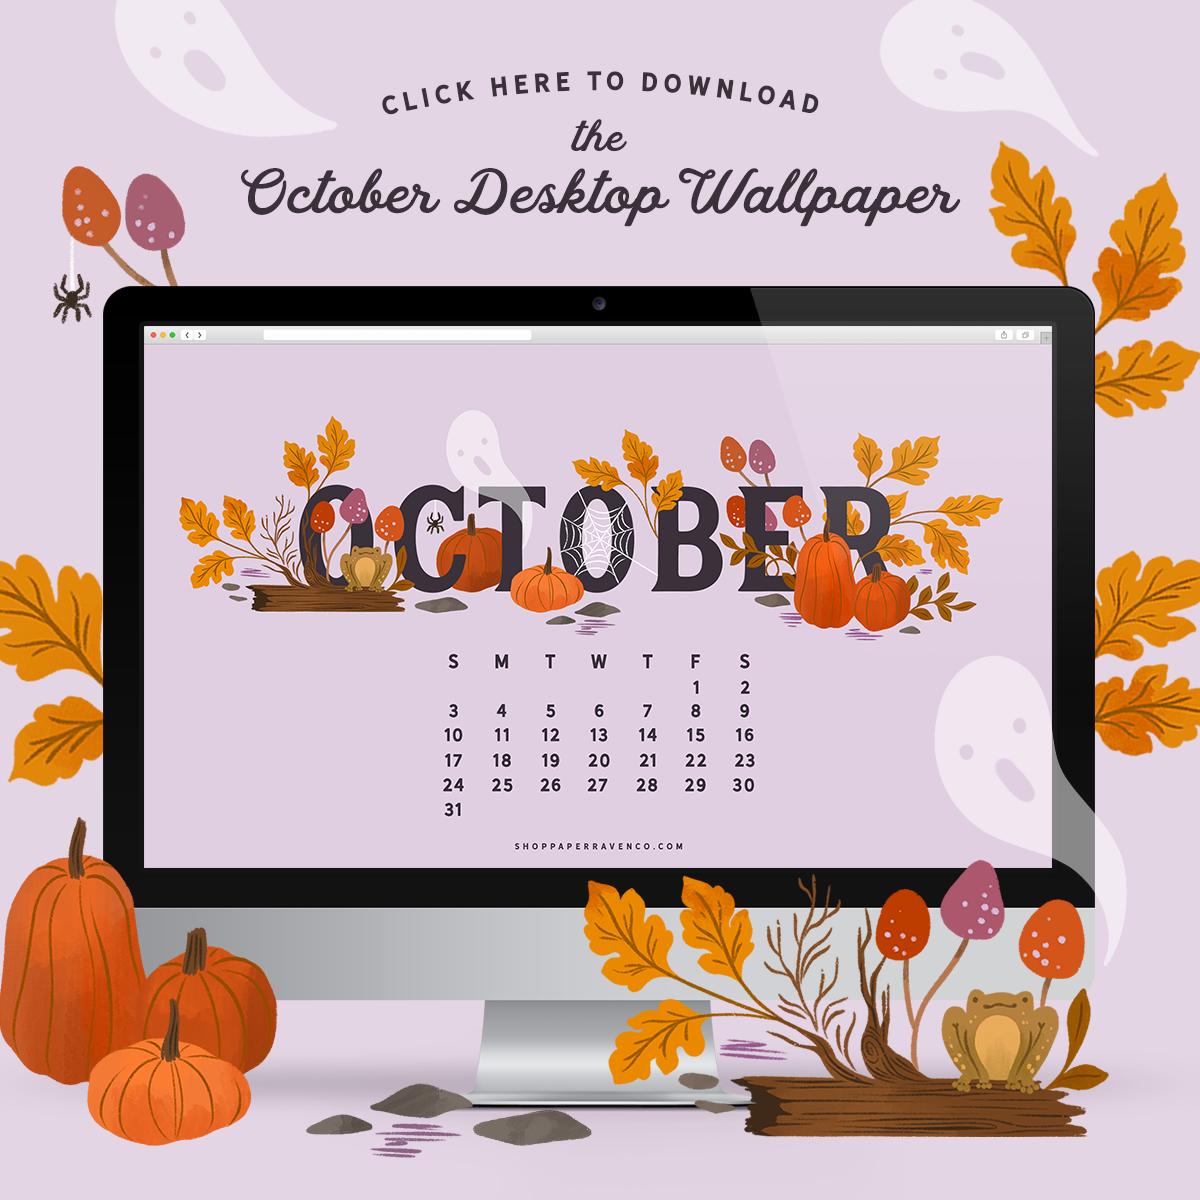 October 2021 Illustrated Desktop Wallpaper by Paper Raven Co. #dressyourtech #desktopwallpaper #desktopdownload